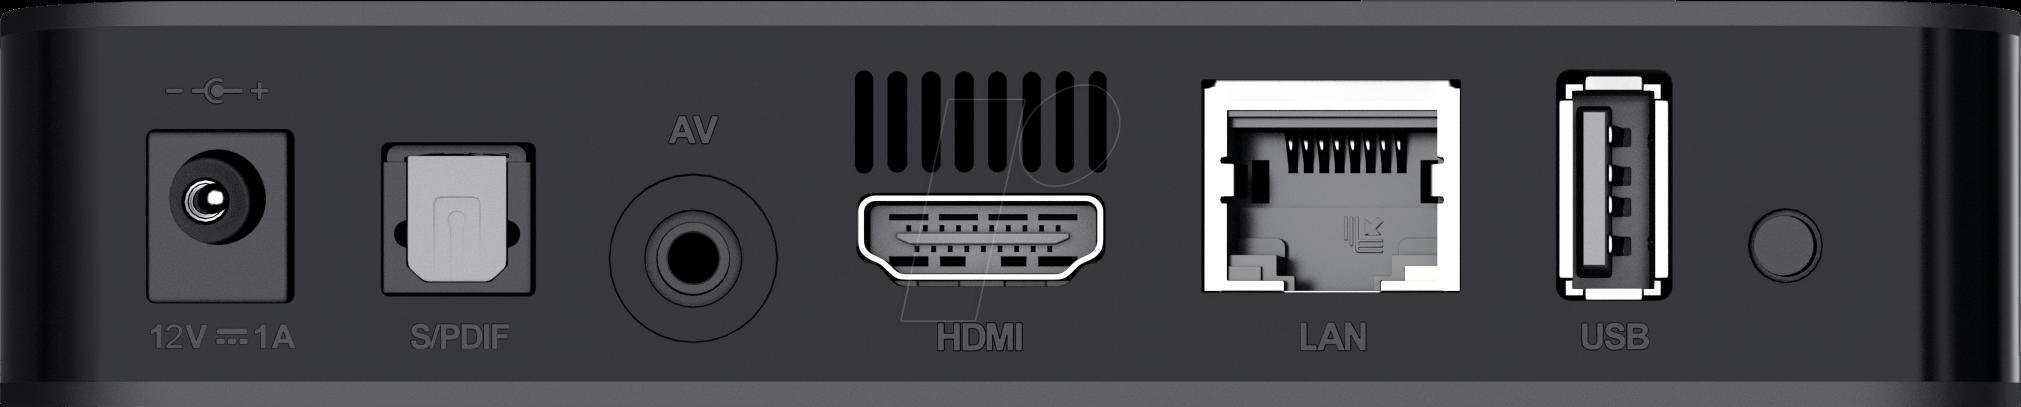 MAG 322W1 - IPTV SET-TOP BOX